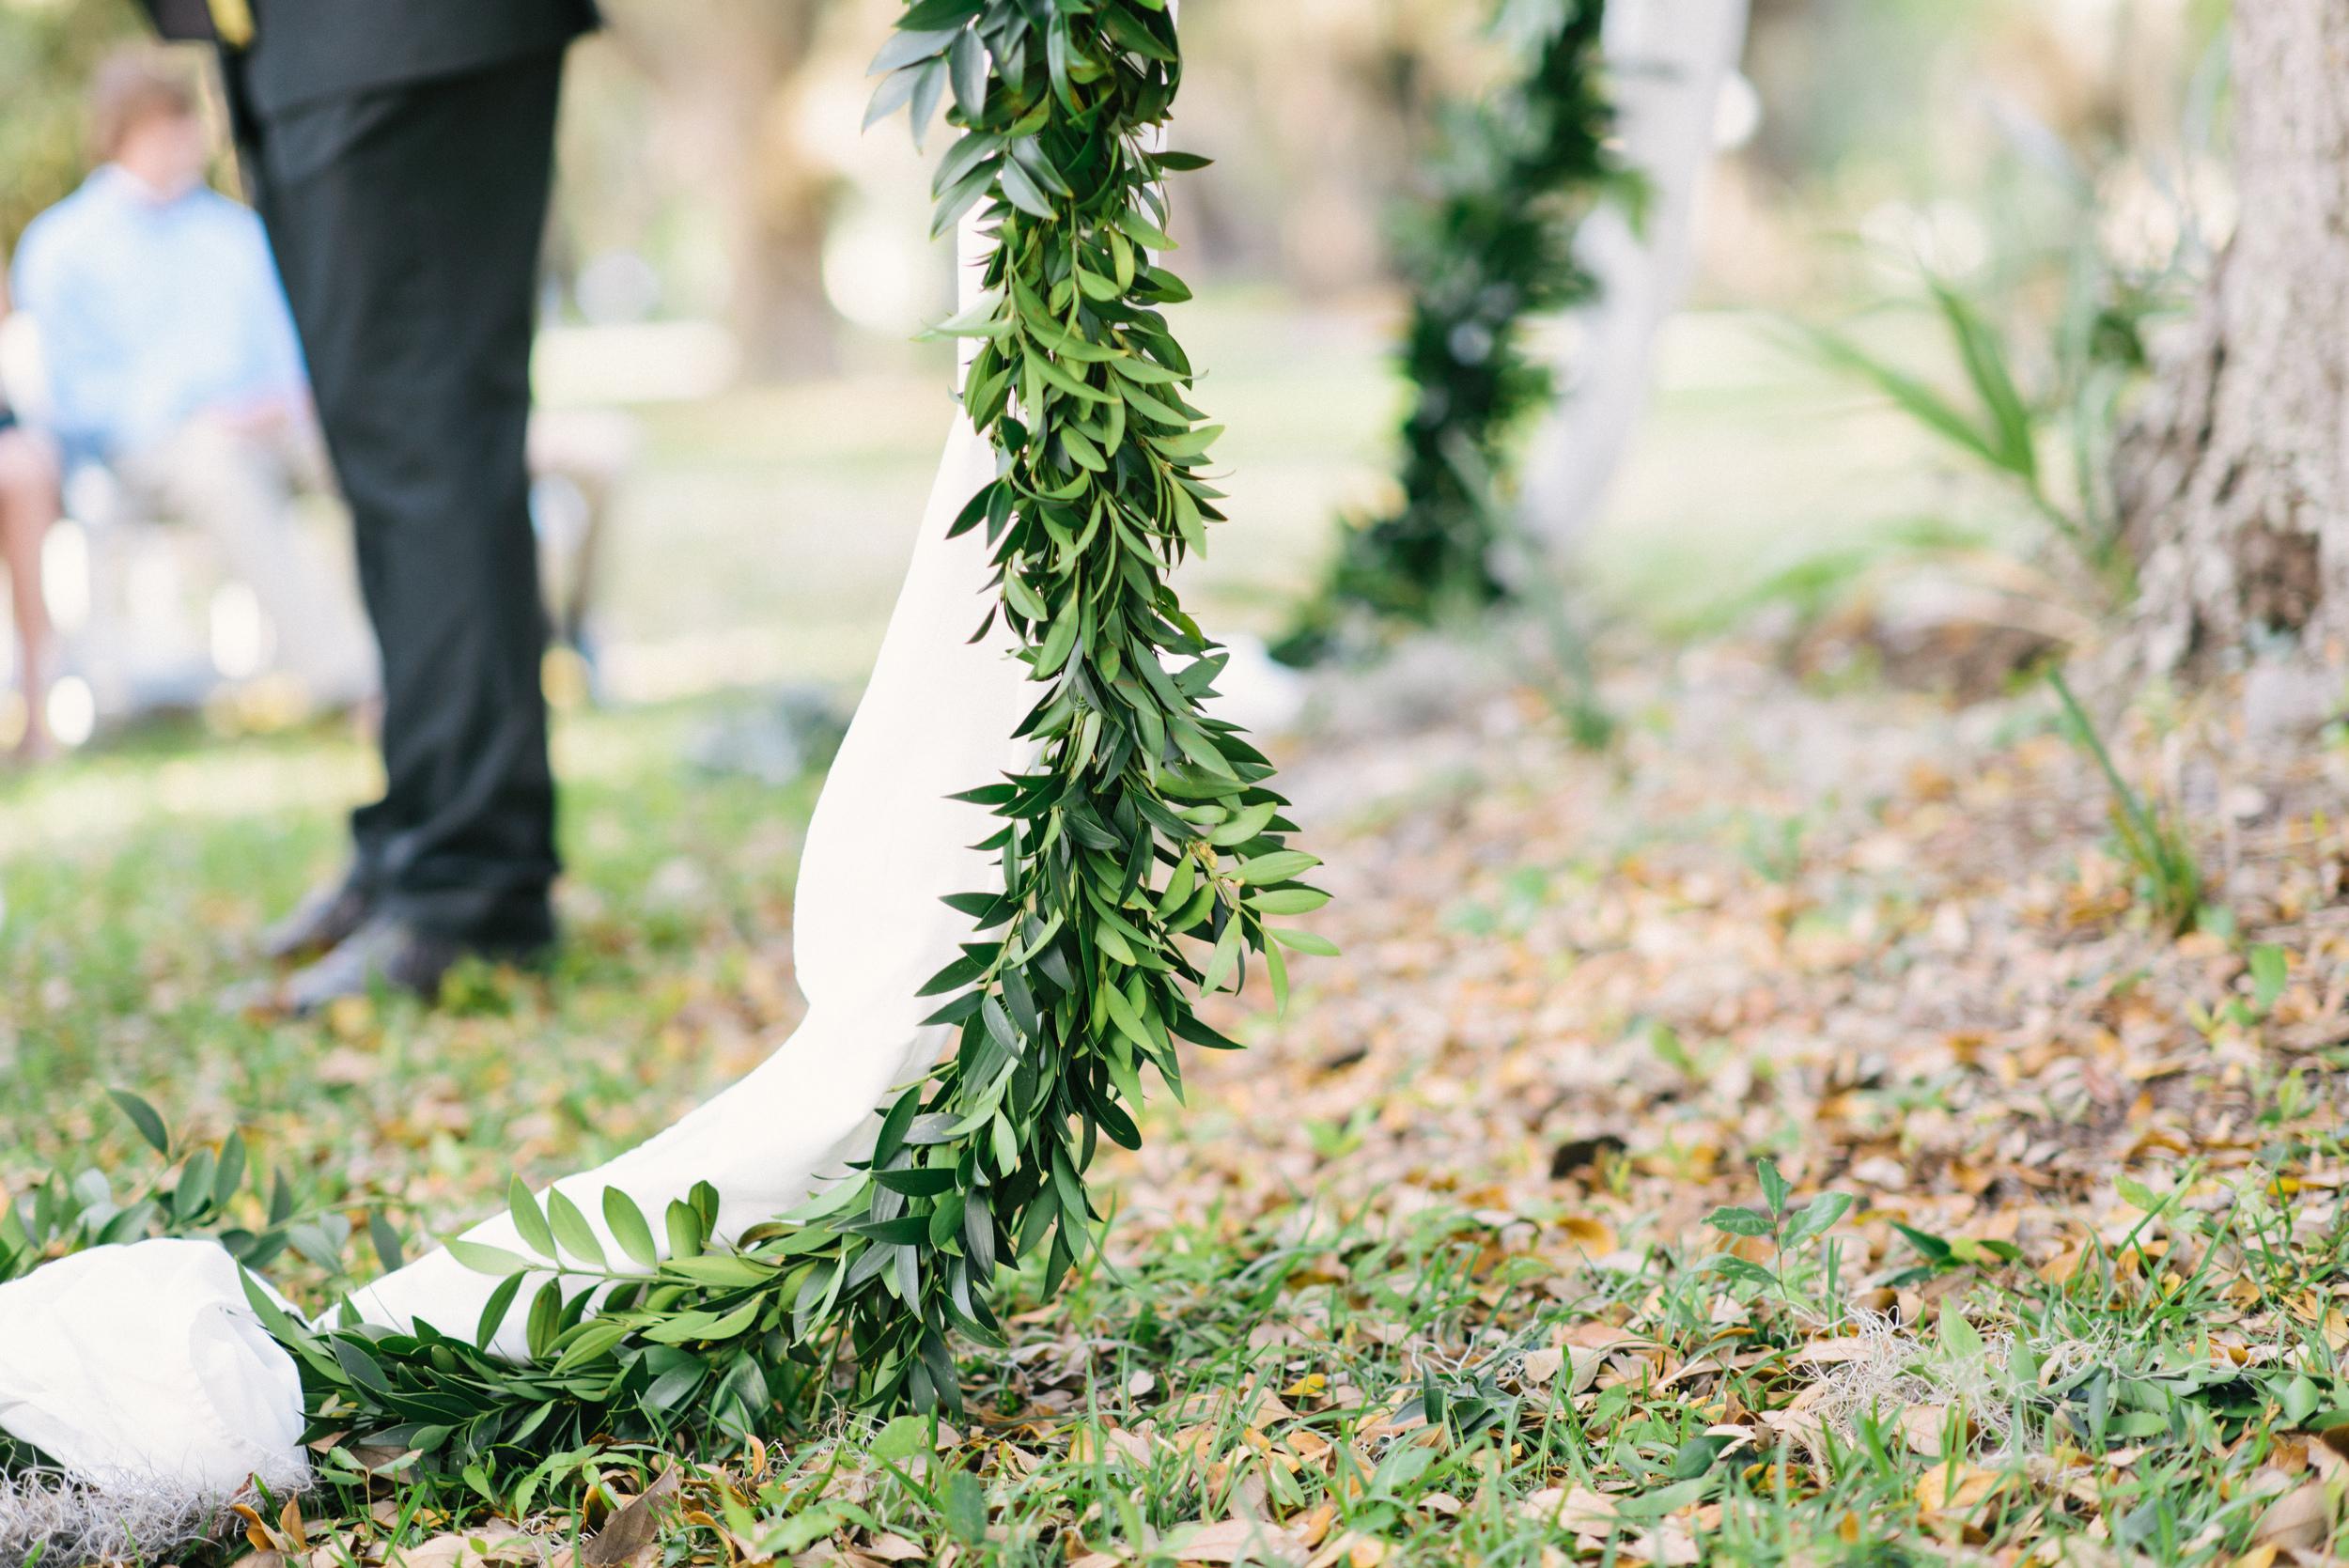 kadi-and-matt-carroll-april-9-2016-jekyl-island-wedding-m-newsom-photography- (490 of 744).jpg